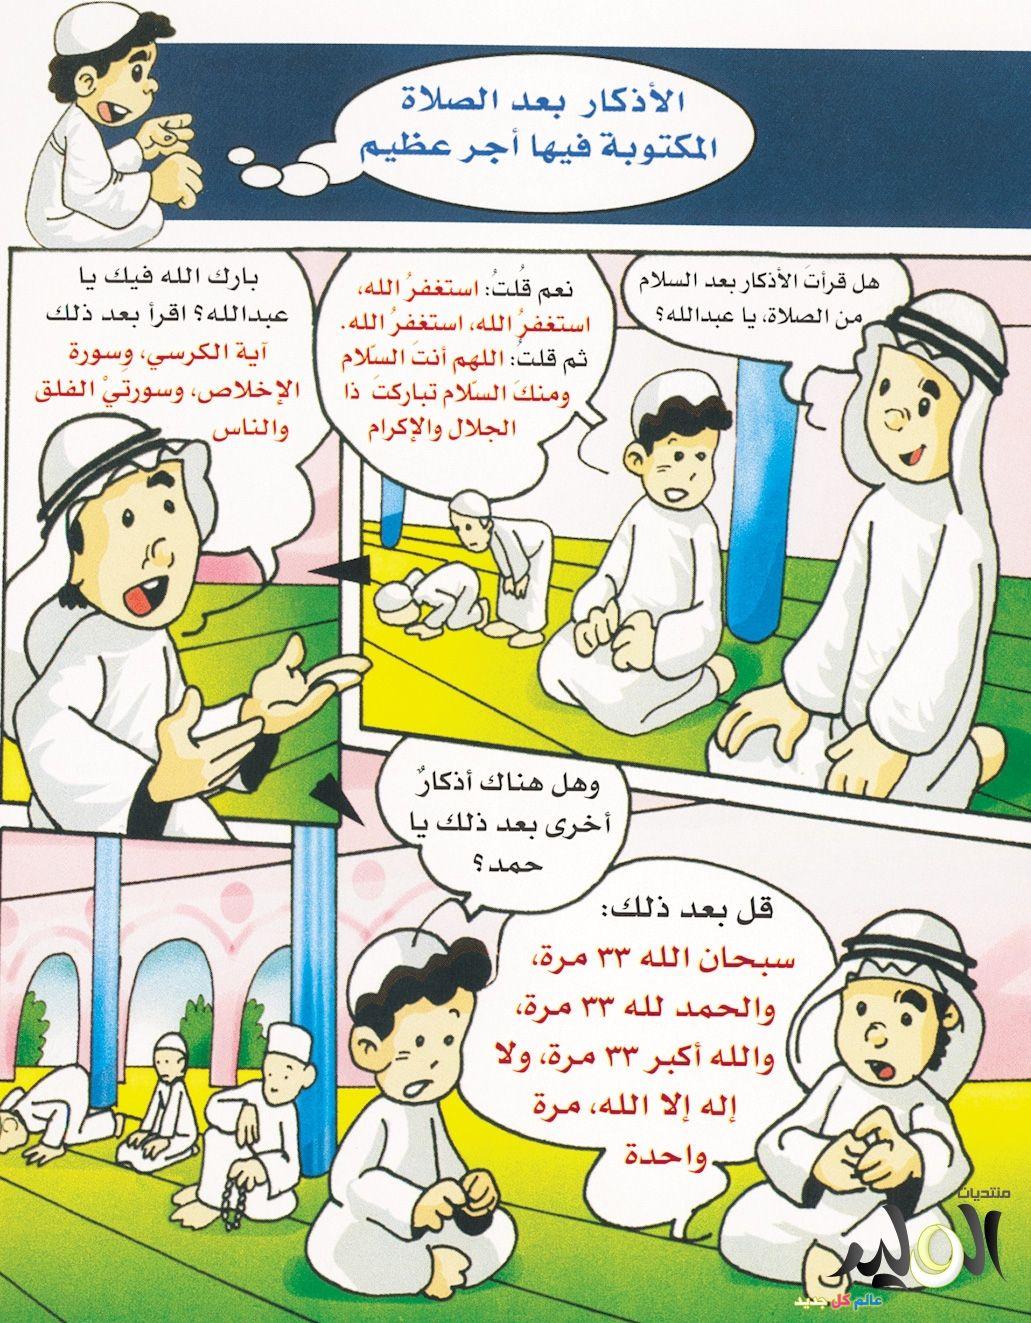 قصص اطفال دينية مصورة 2018 قصص اطفال اسلامية مصورة 2018 الوليد Comics Comic Books Comic Book Cover